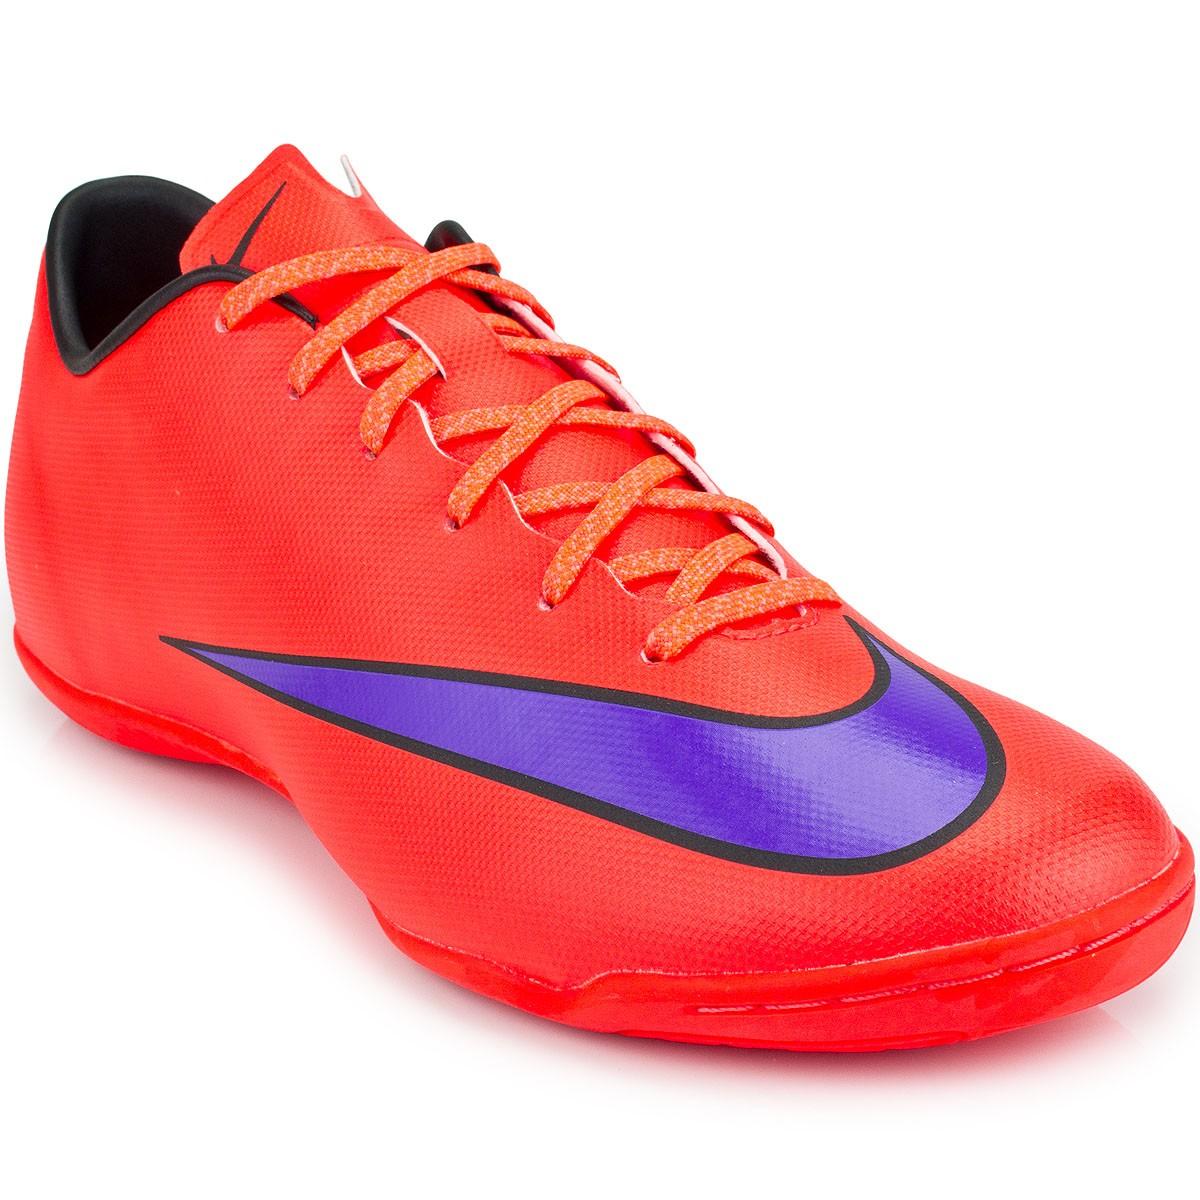 Chuteira Nike Mercurial Victory V IC 651635 1de0adee9dbe4